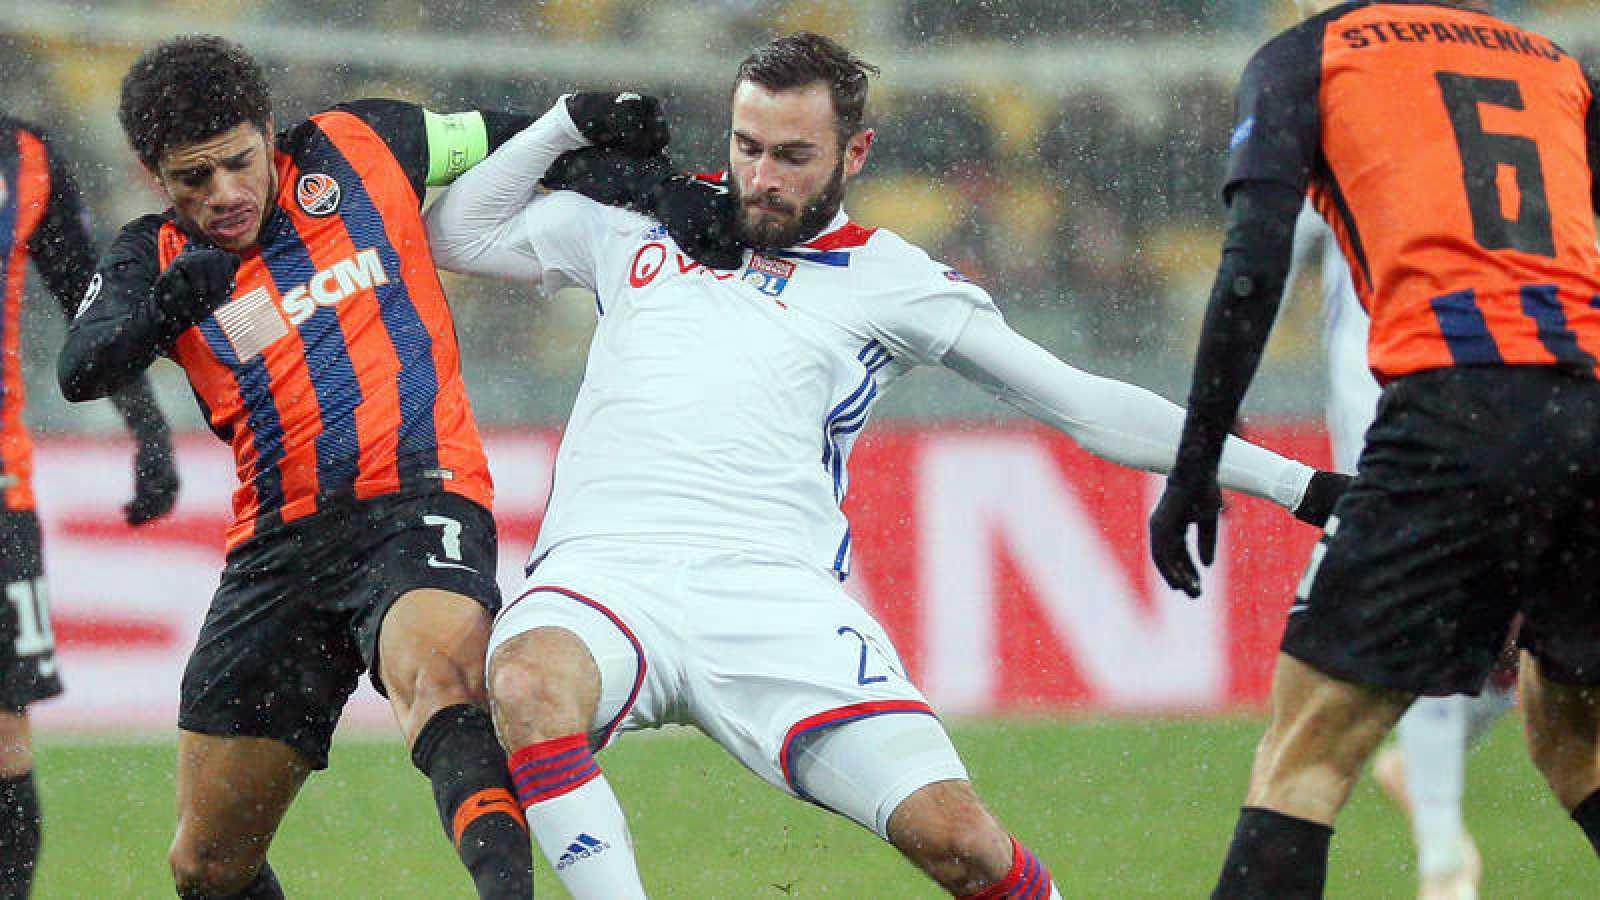 Shakhtar Donetsk - Olympique Lyon